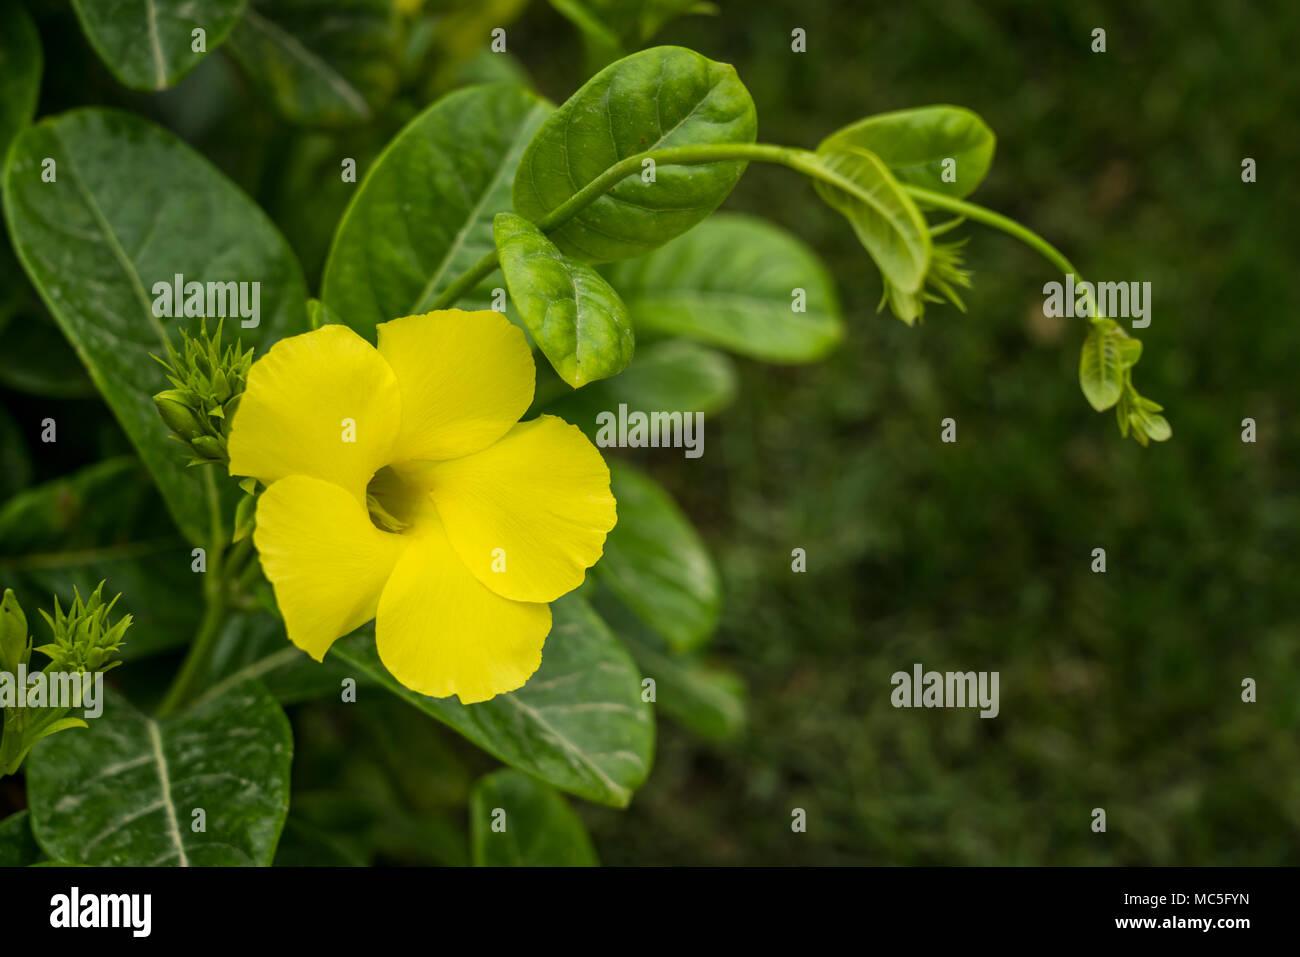 Yellow Tropical Flowers Stock Photos Yellow Tropical Flowers Stock